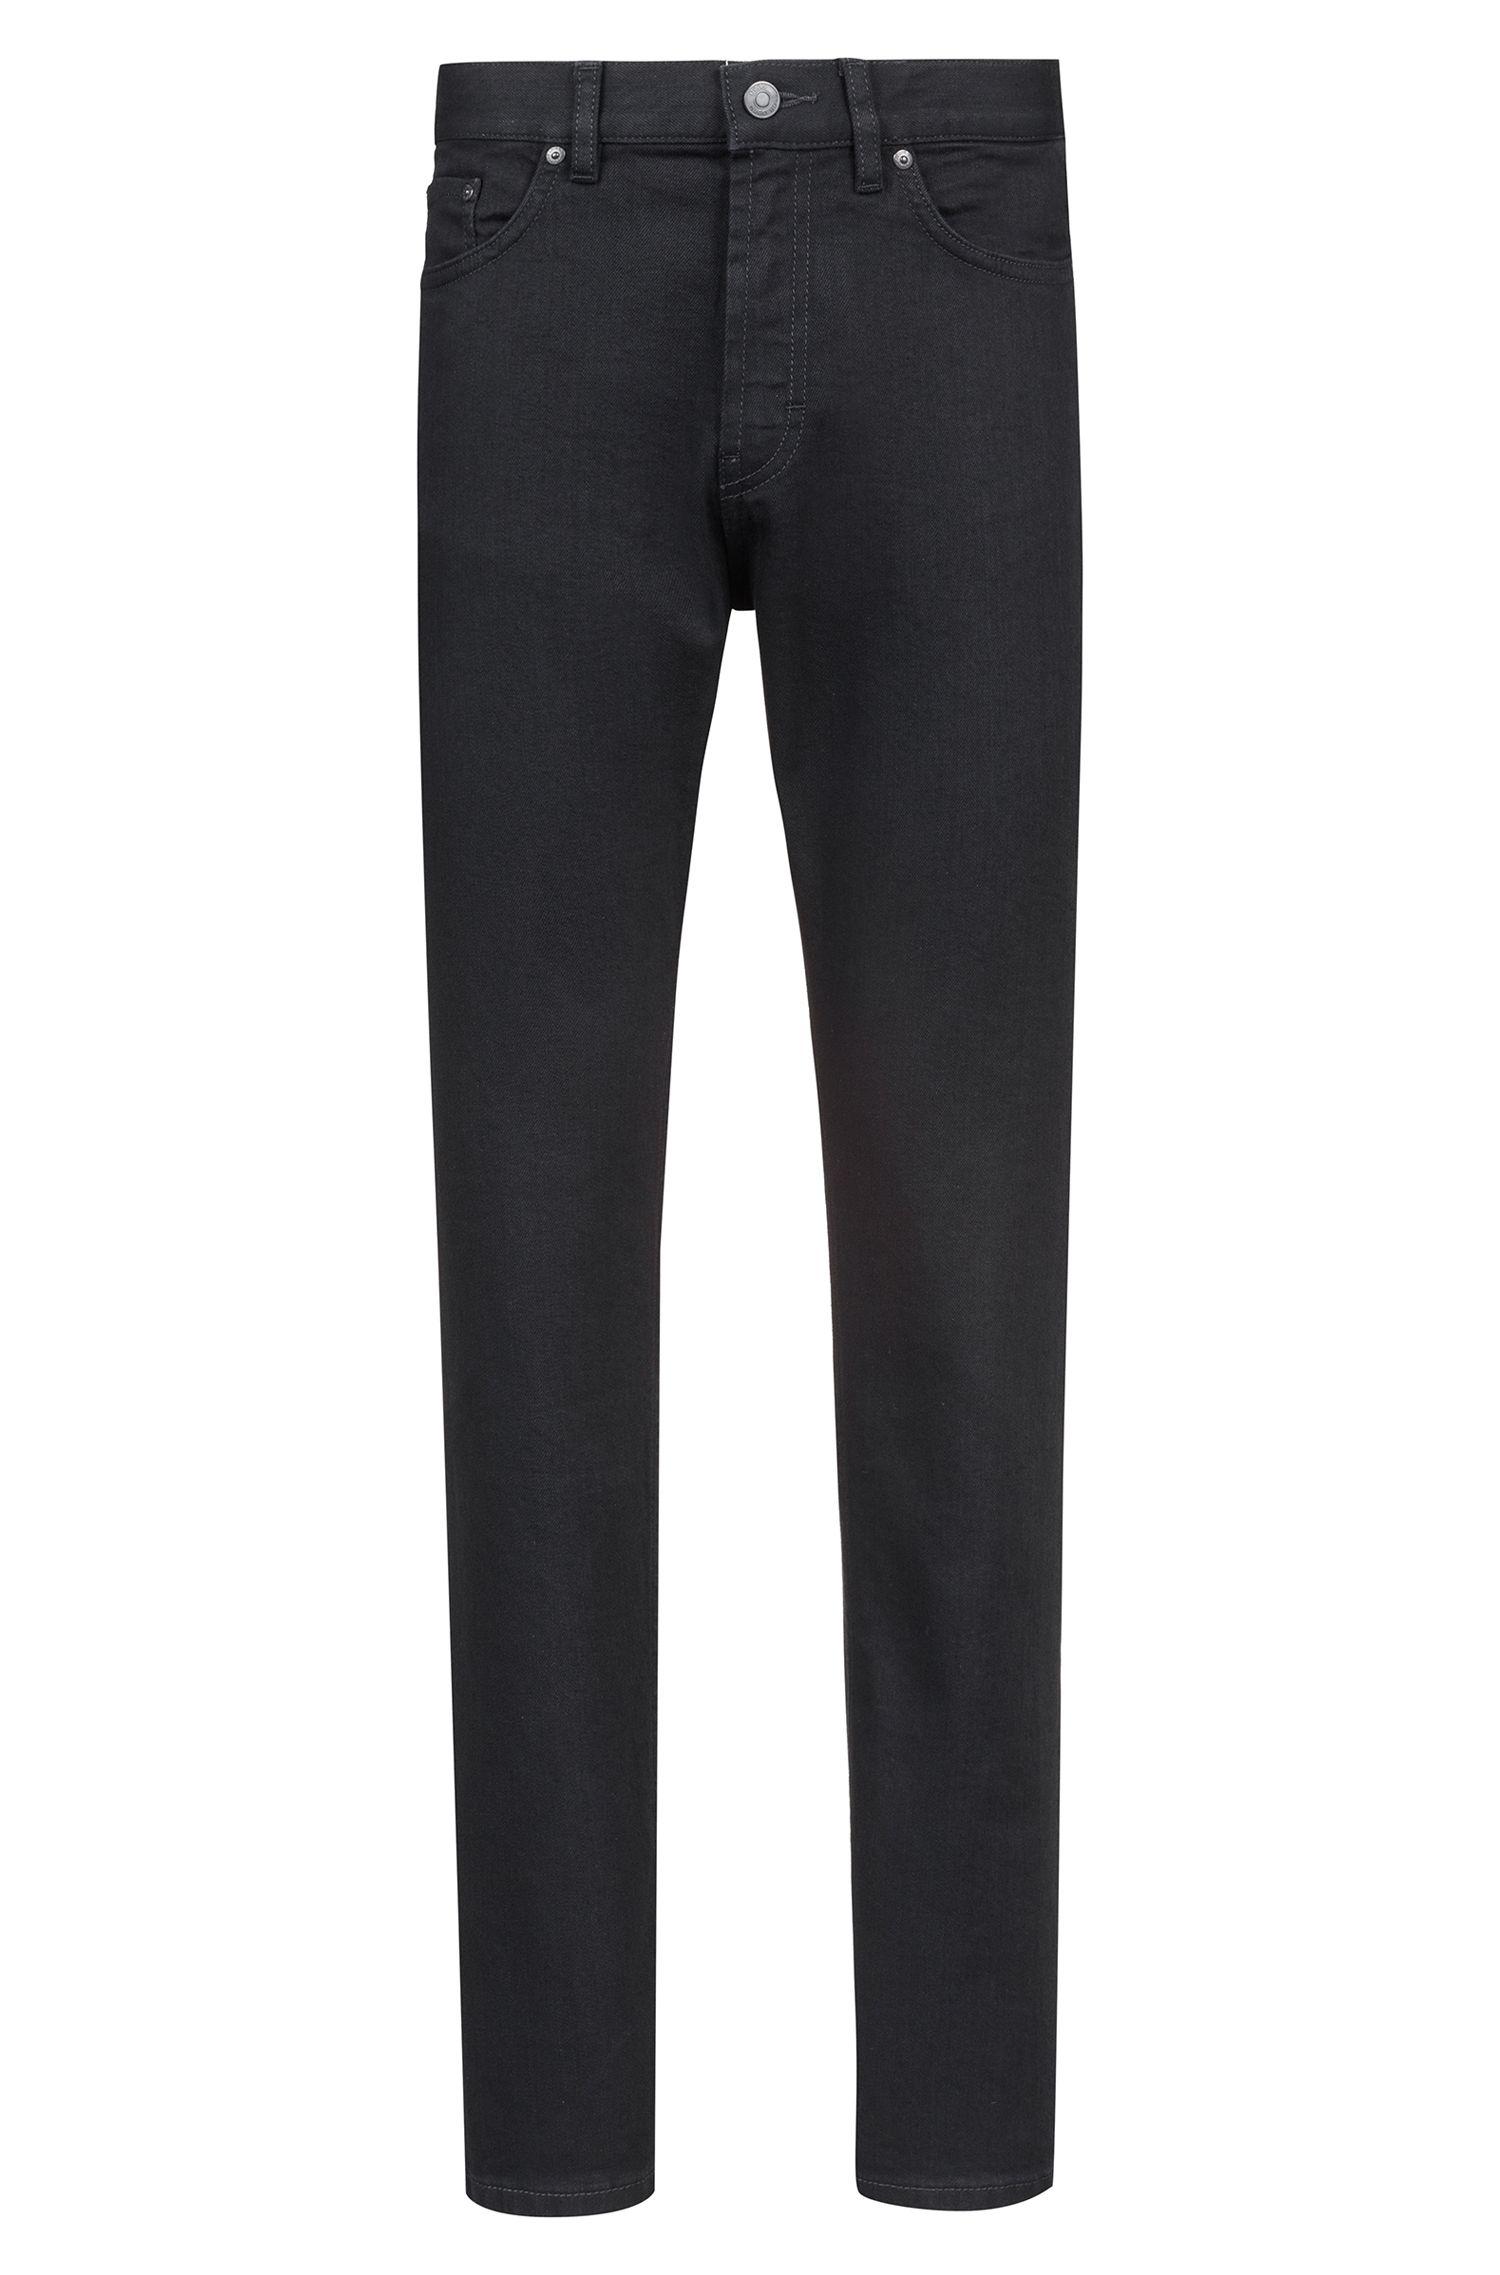 Straight-leg jeans in soft-washed black stretch denim, Black